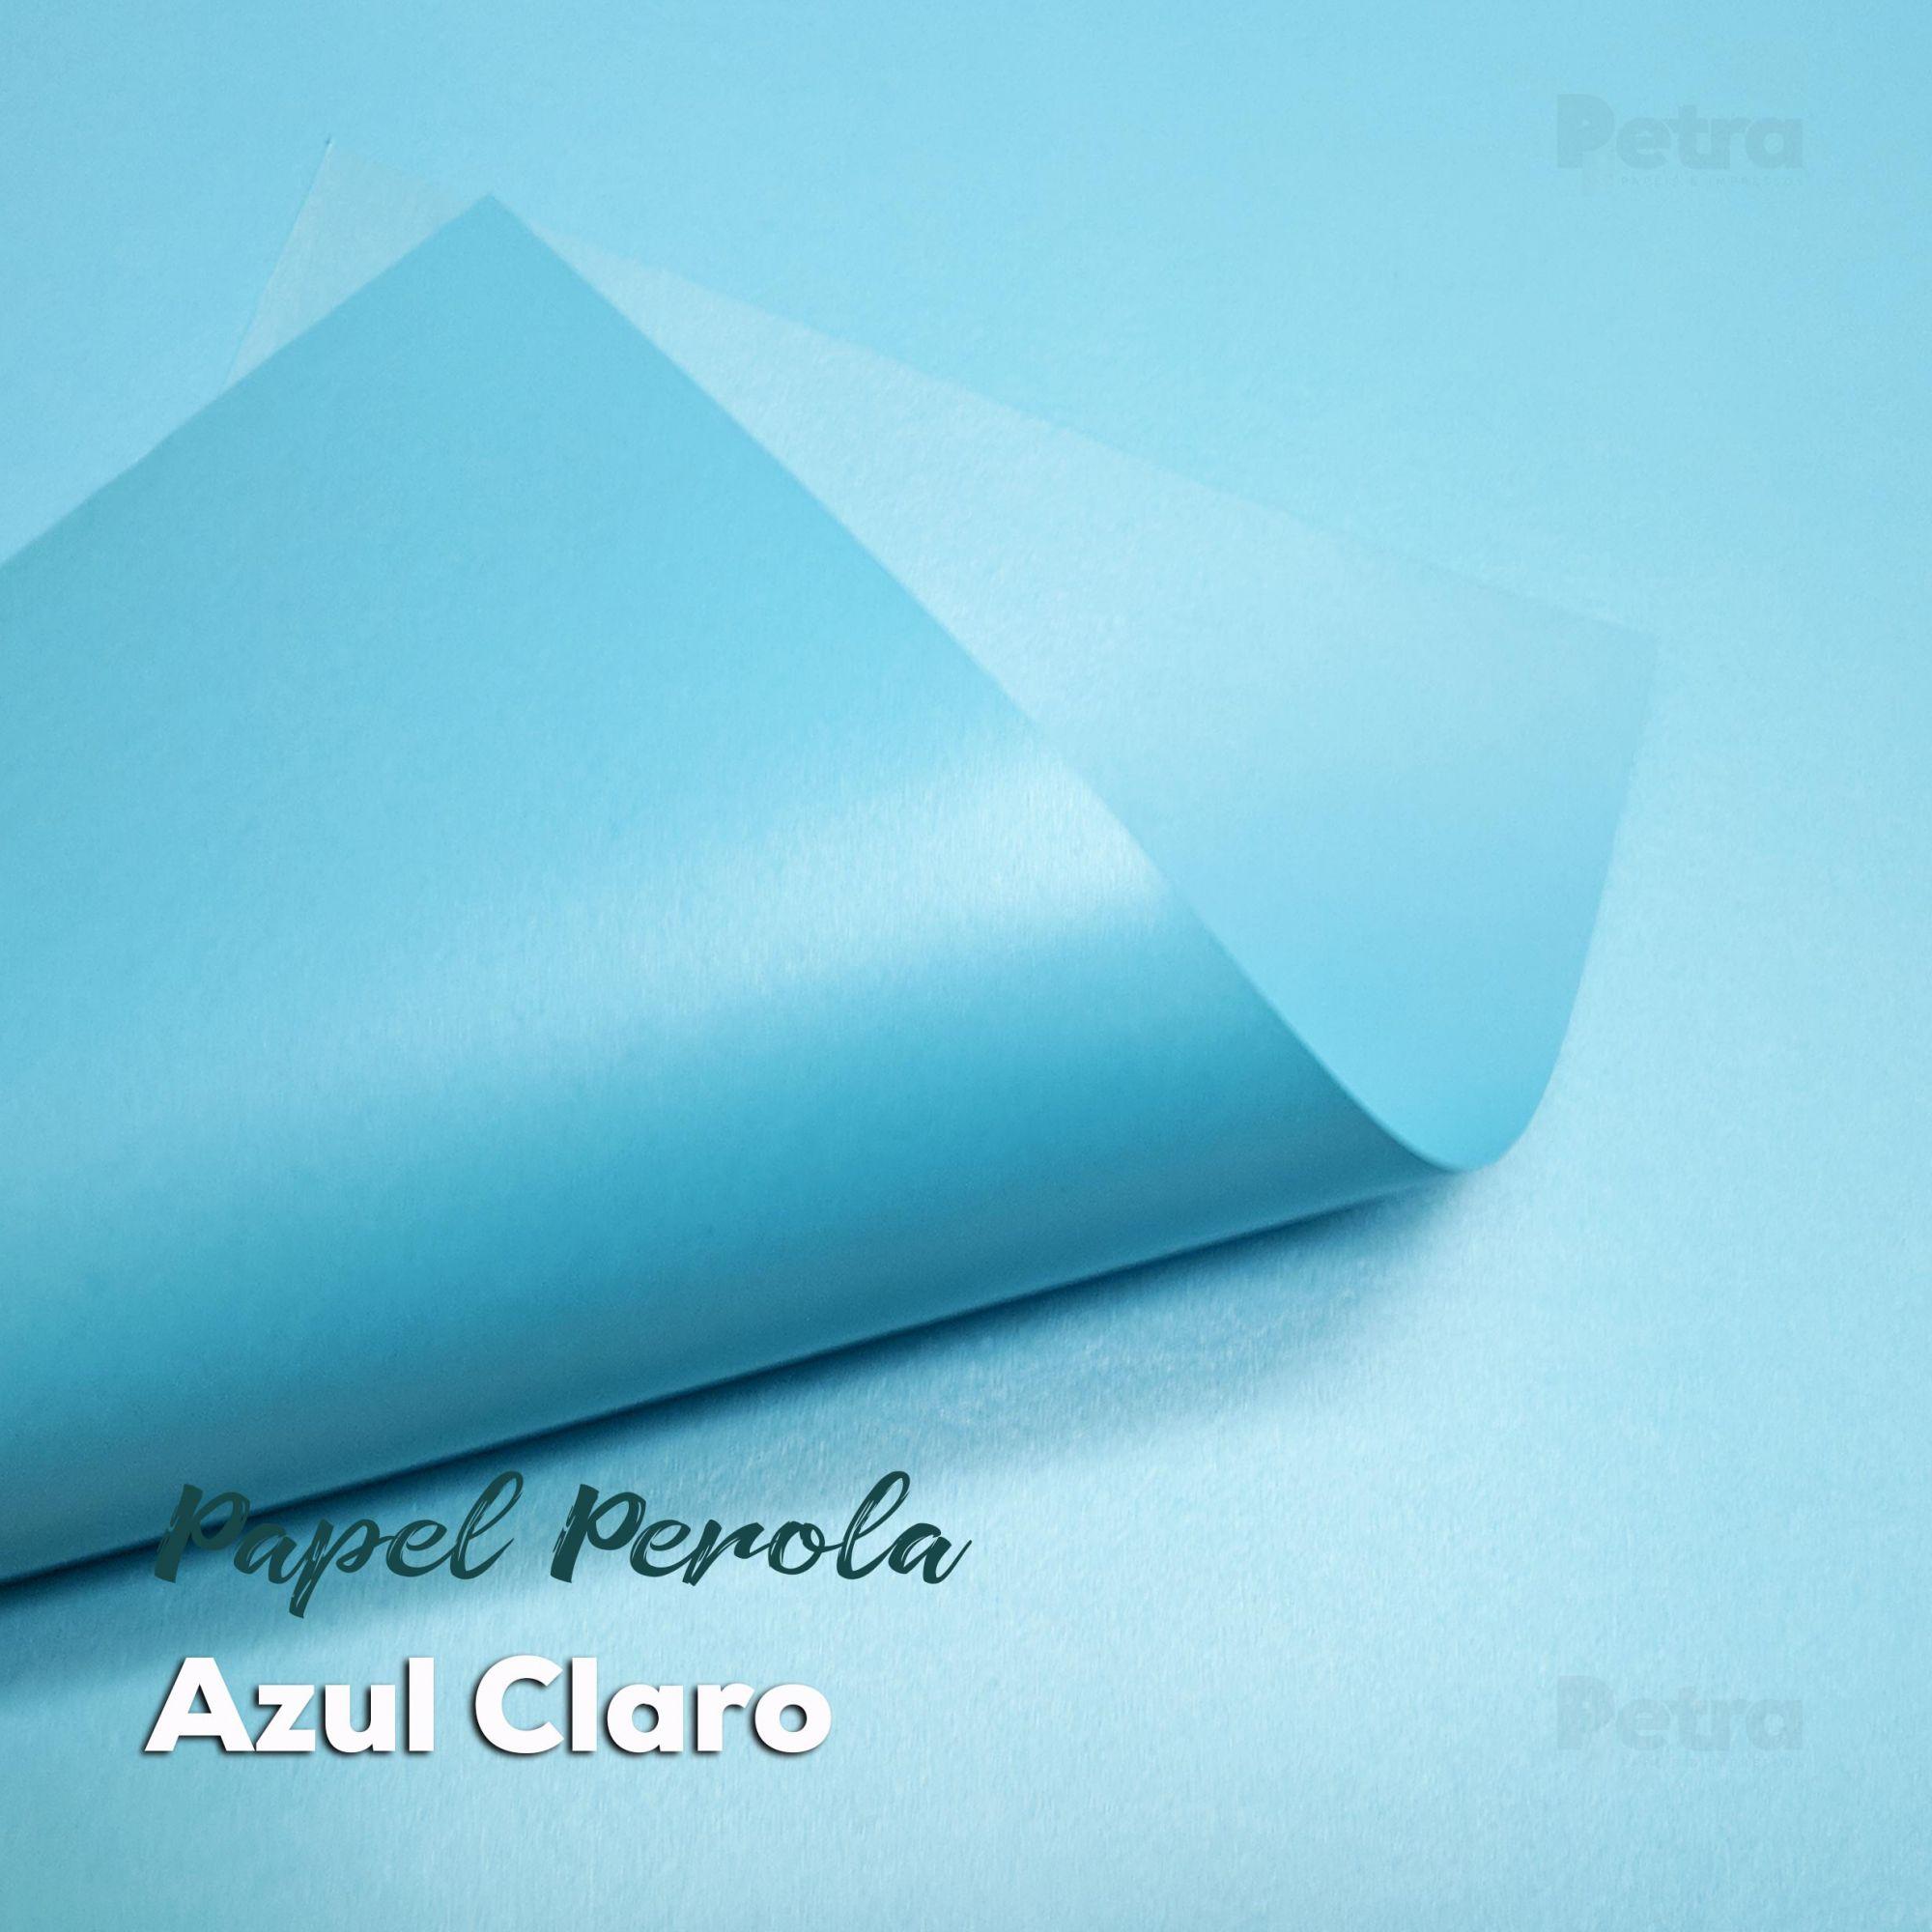 Papel Pérola Azul Claro Tam: 48x66cm 240g/m²